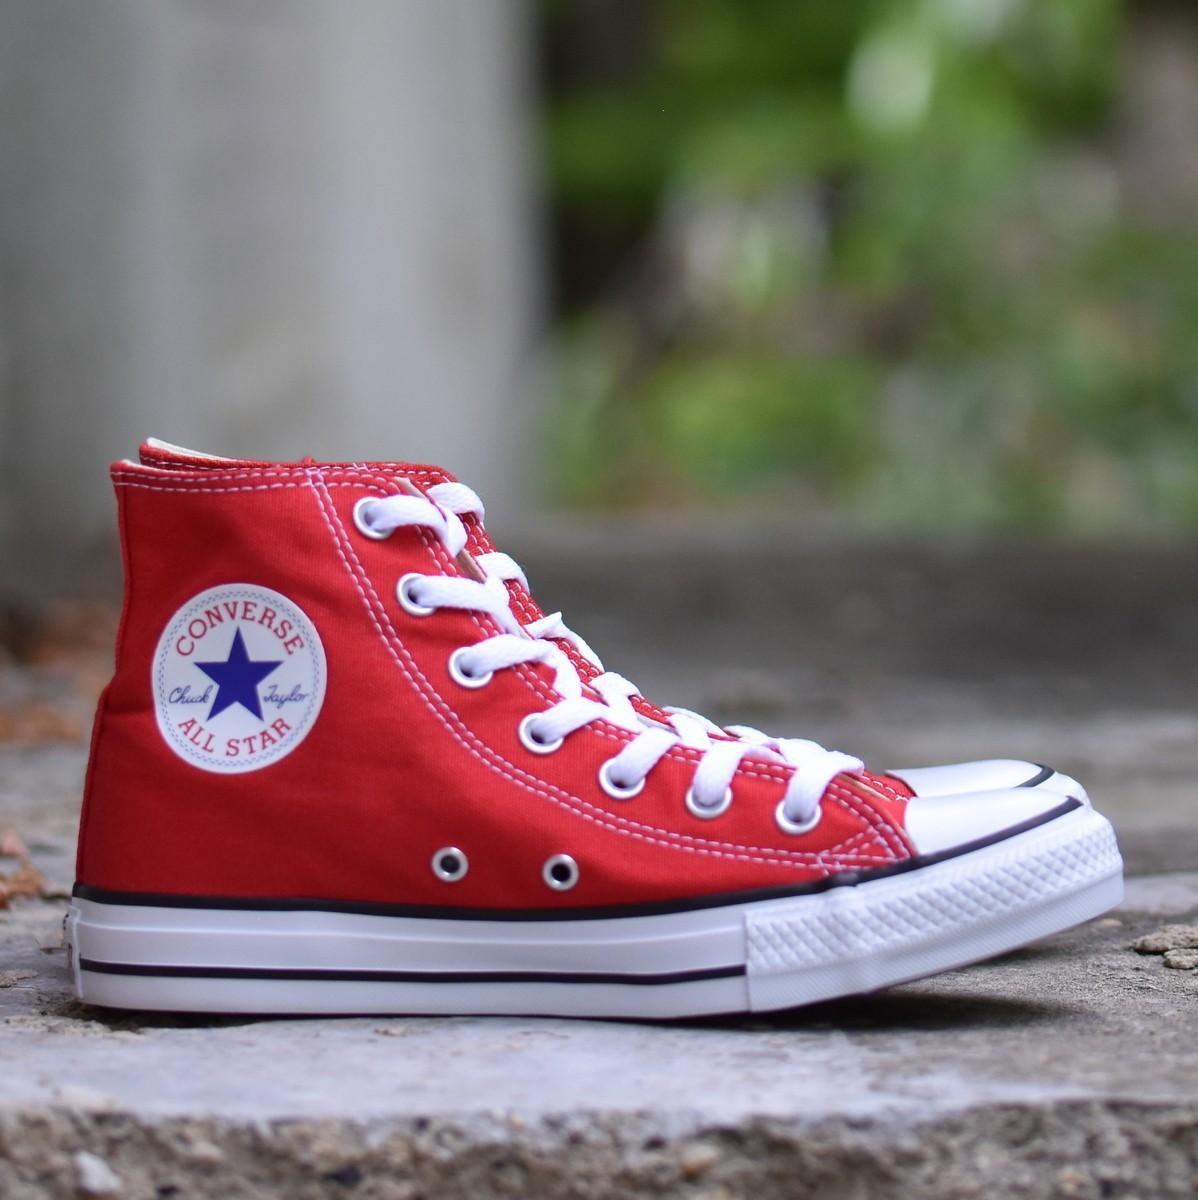 converse Chuck Taylor All Star Unisex boty M9621 - Glami.cz 83ec33d0b4